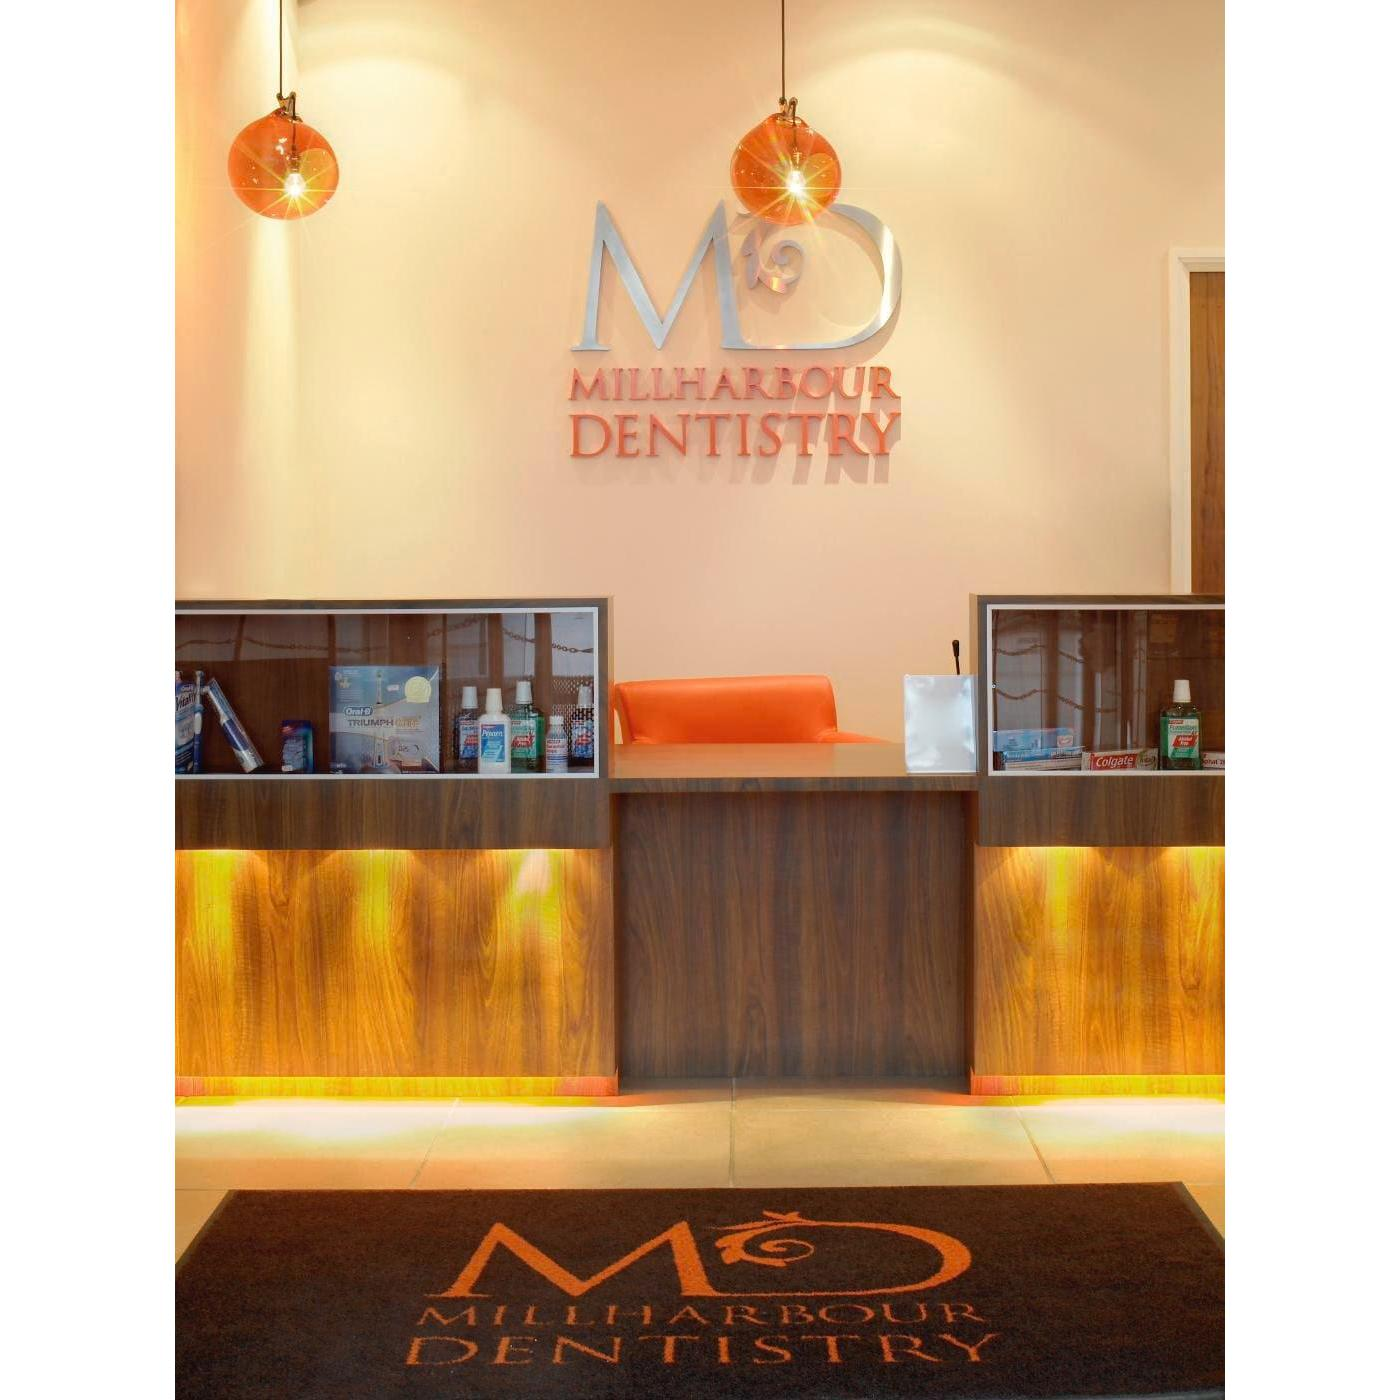 Millharbour Dentistry - London, London E14 9DH - 020 7538 4131 | ShowMeLocal.com